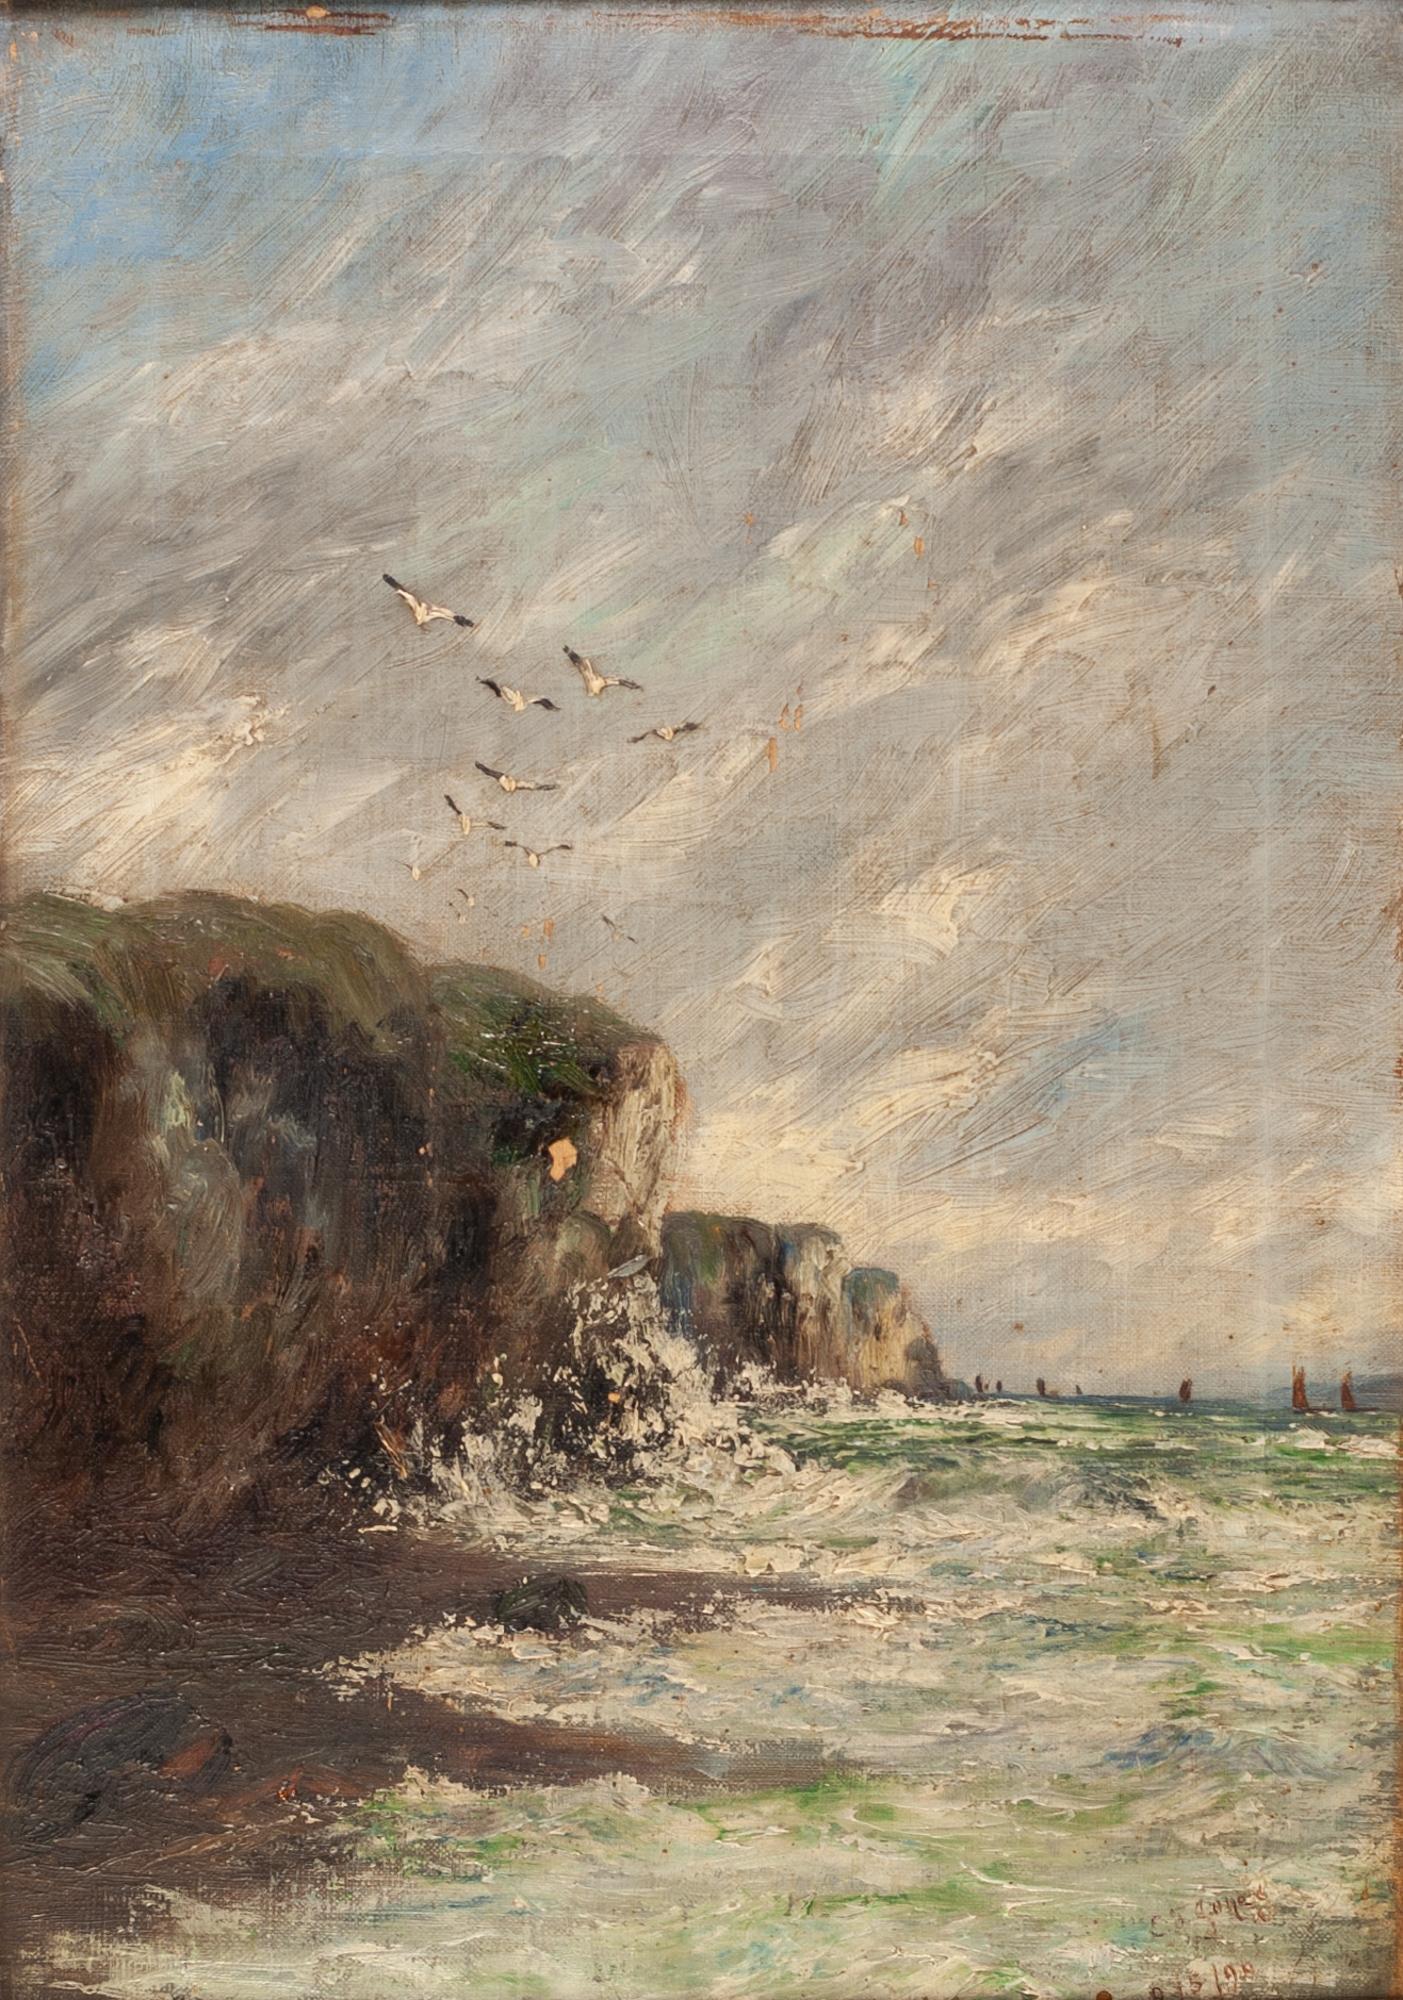 Lot 259 - E.J. JONES (LATE NINETEENTH CENTURY) OIL PAINTING ON CANVAS Coastal scene with birds in flight above